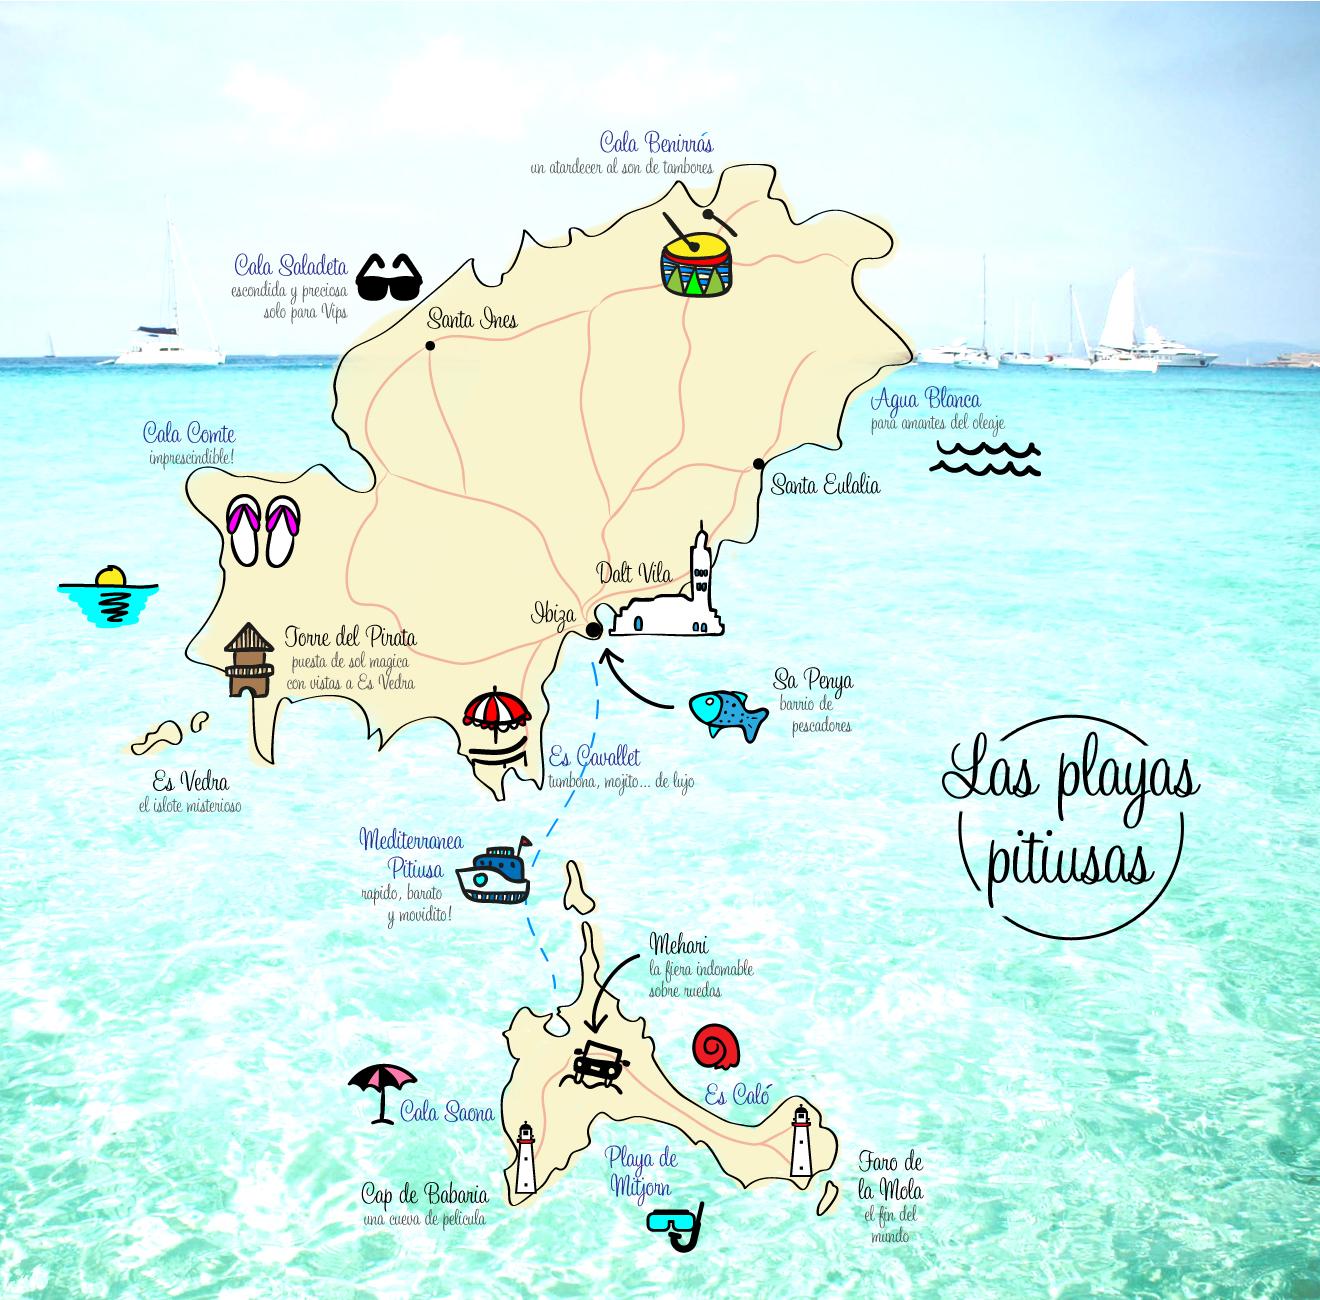 Playas De Ibiza Mapa.Mapa Ibiza Las Playas La Maleta Extraviada